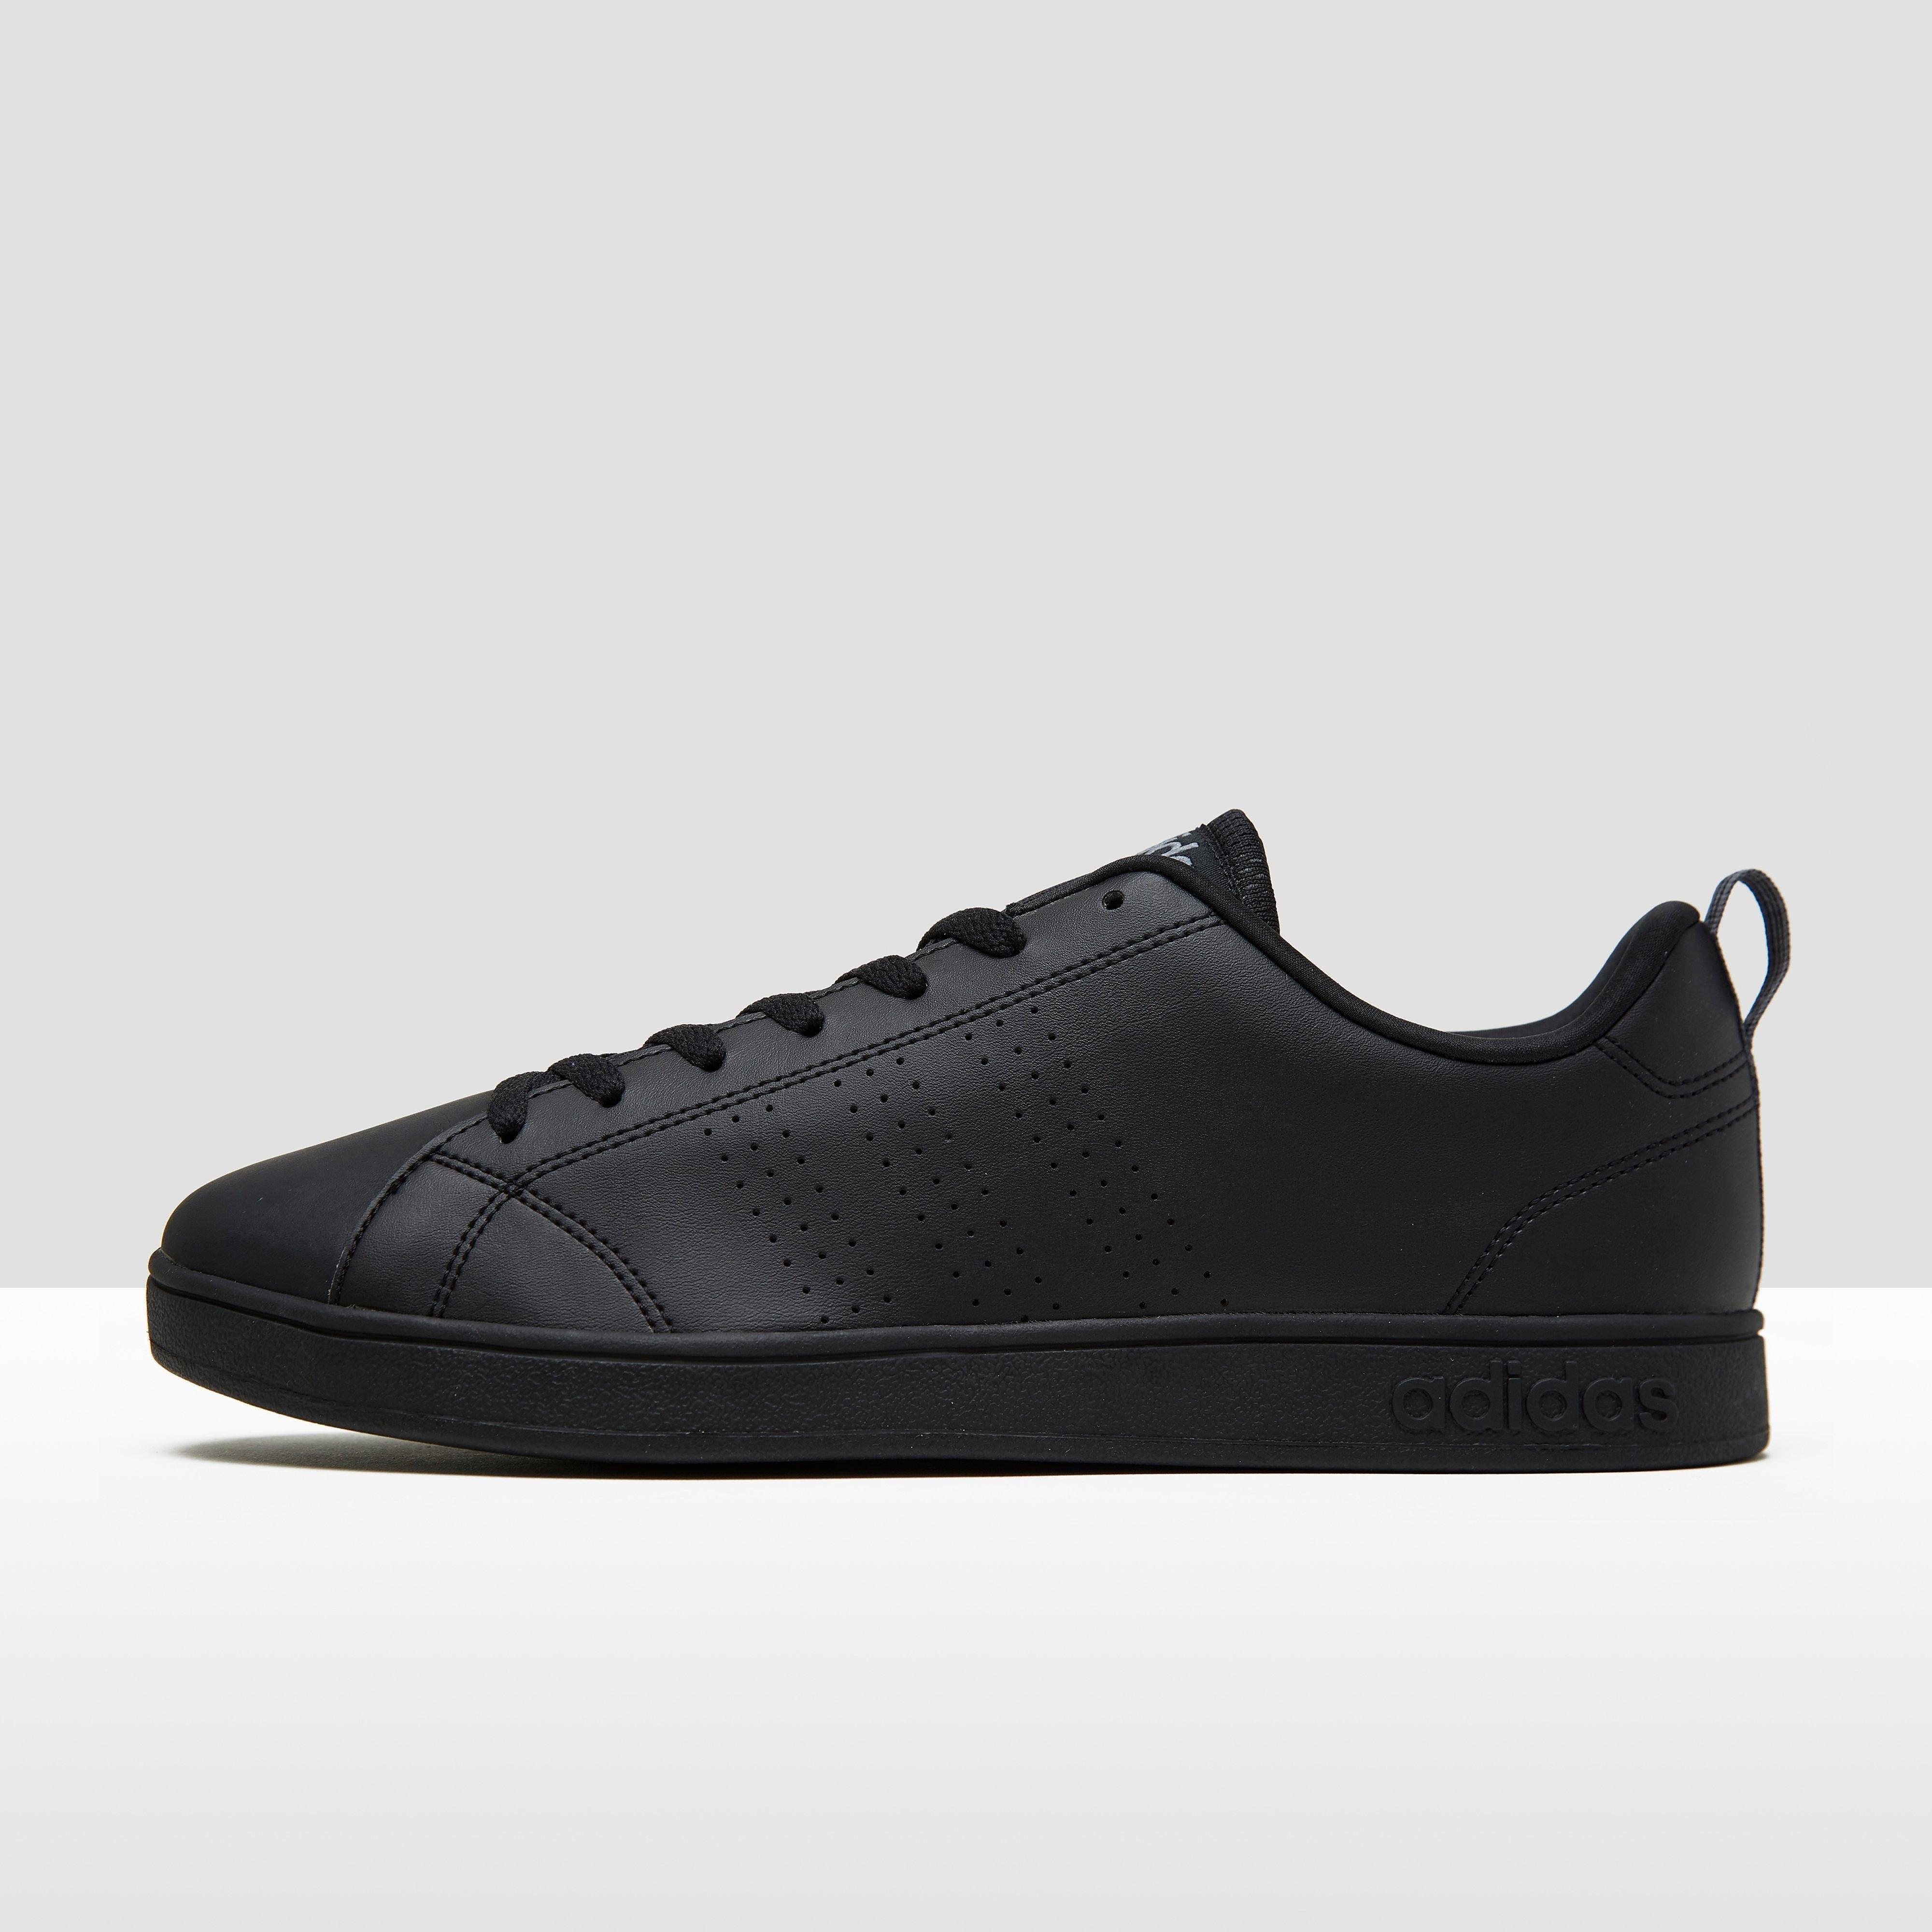 Sneakers adidas Advantage Clean VS F99253